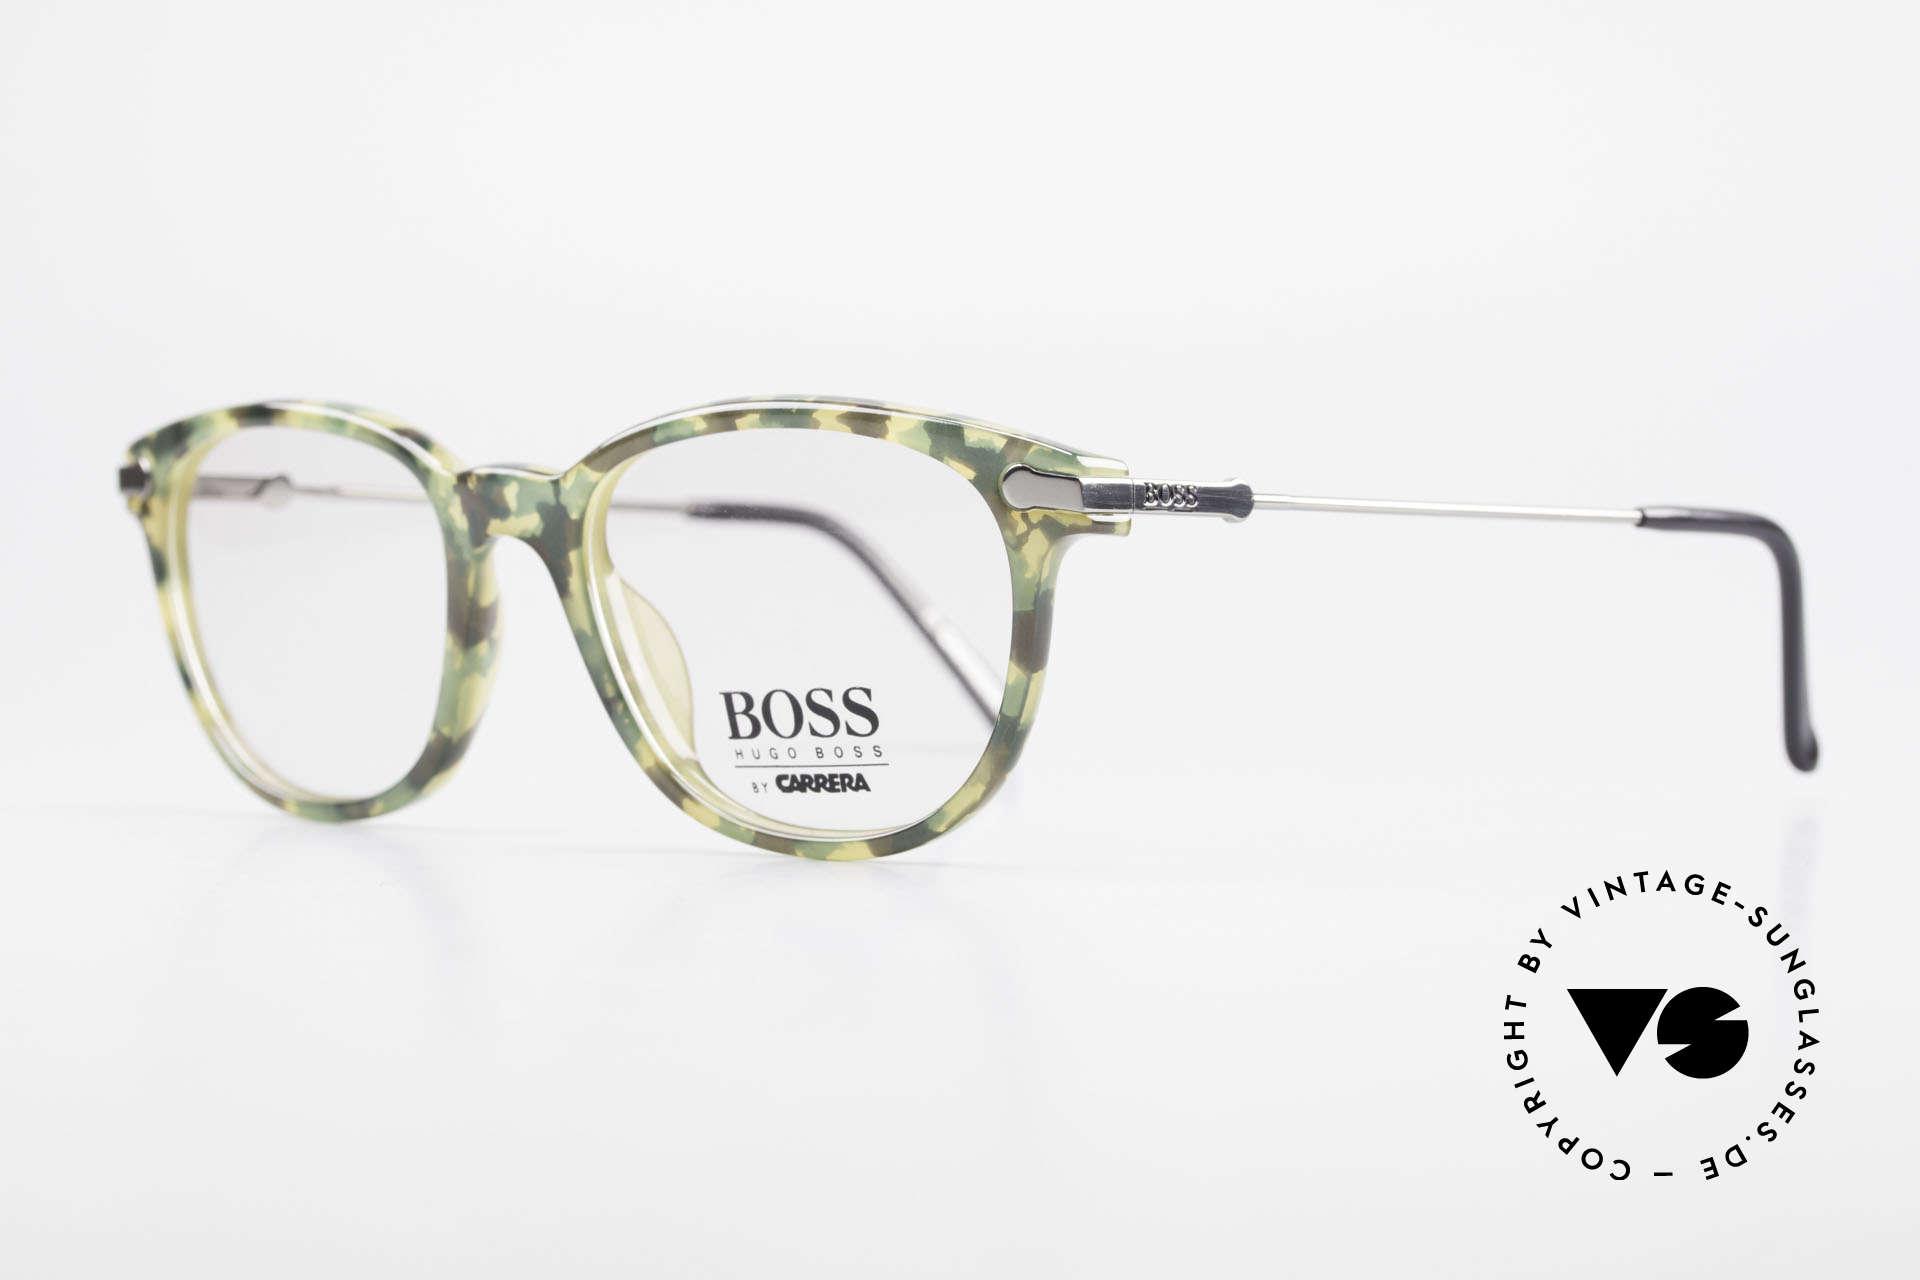 "BOSS 5115 Camouflage Vintage Eyeglasses, frame front looks like ""camouflage"" green patterned, Made for Men"